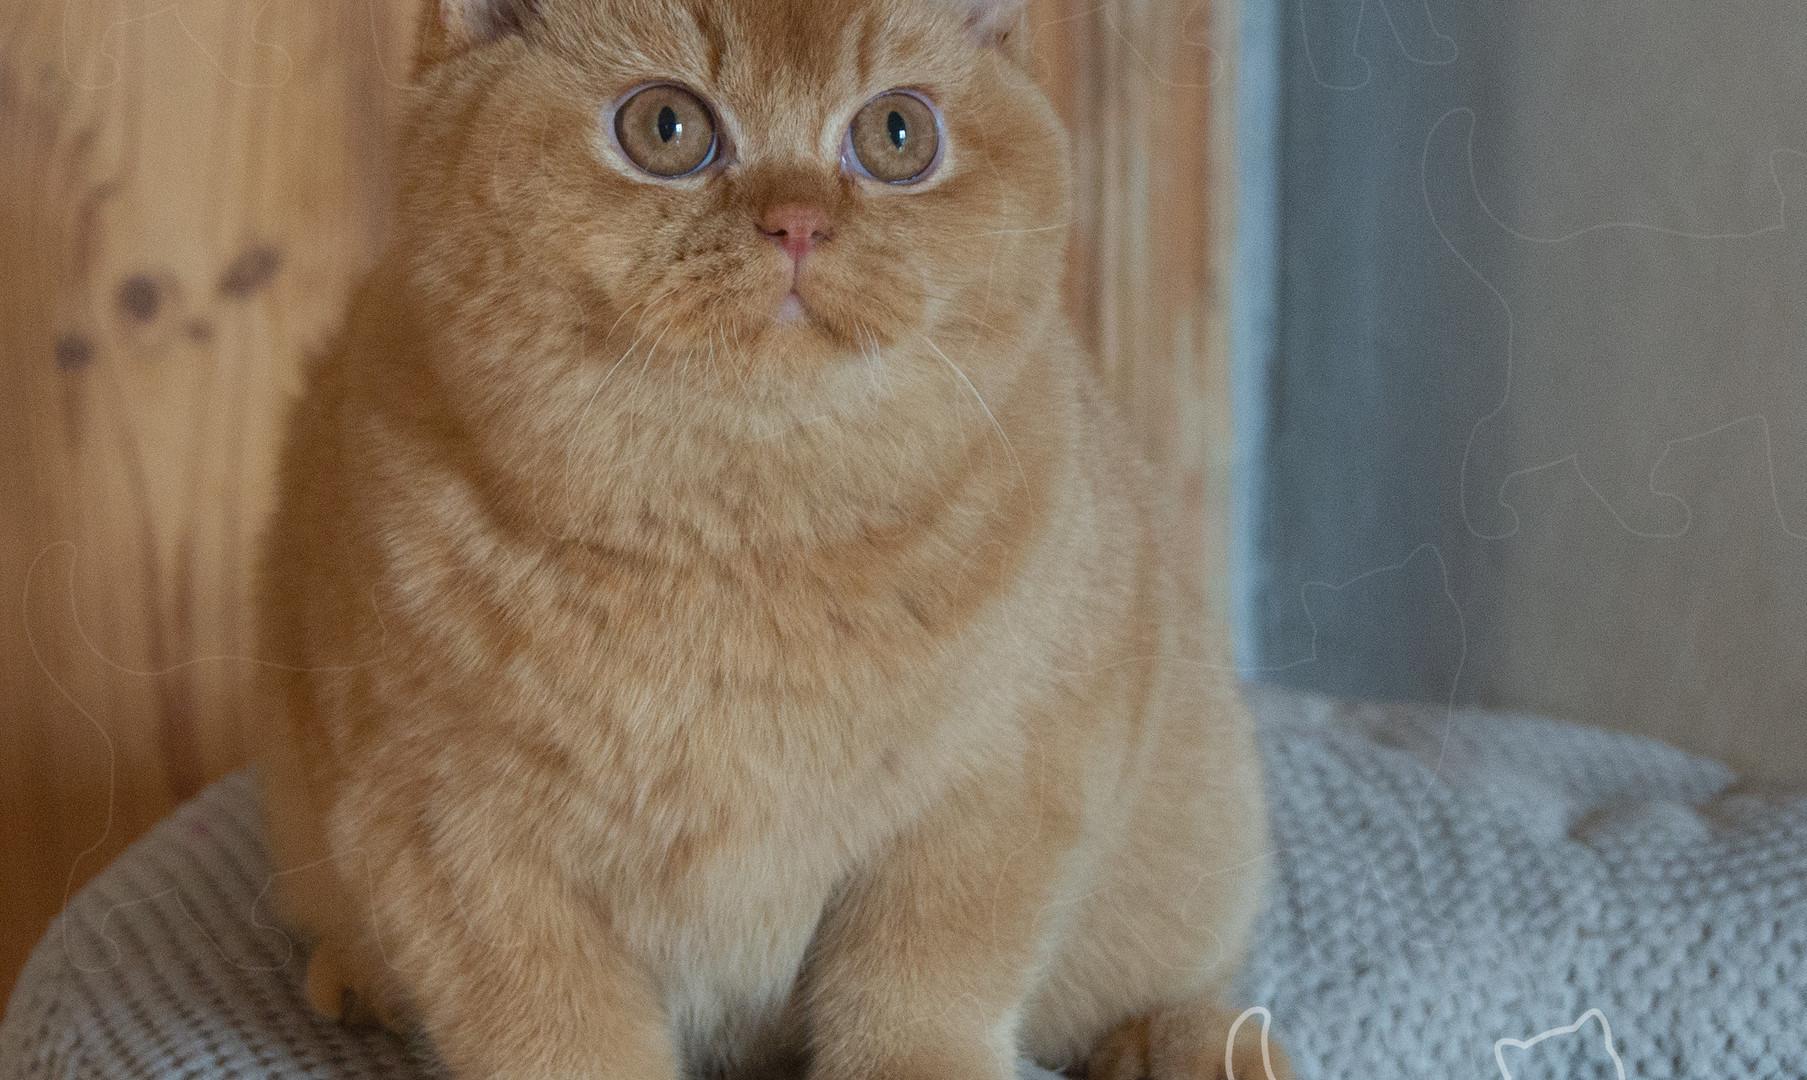 rudy kot brytyjski Mymble Vabank*PL.JPG